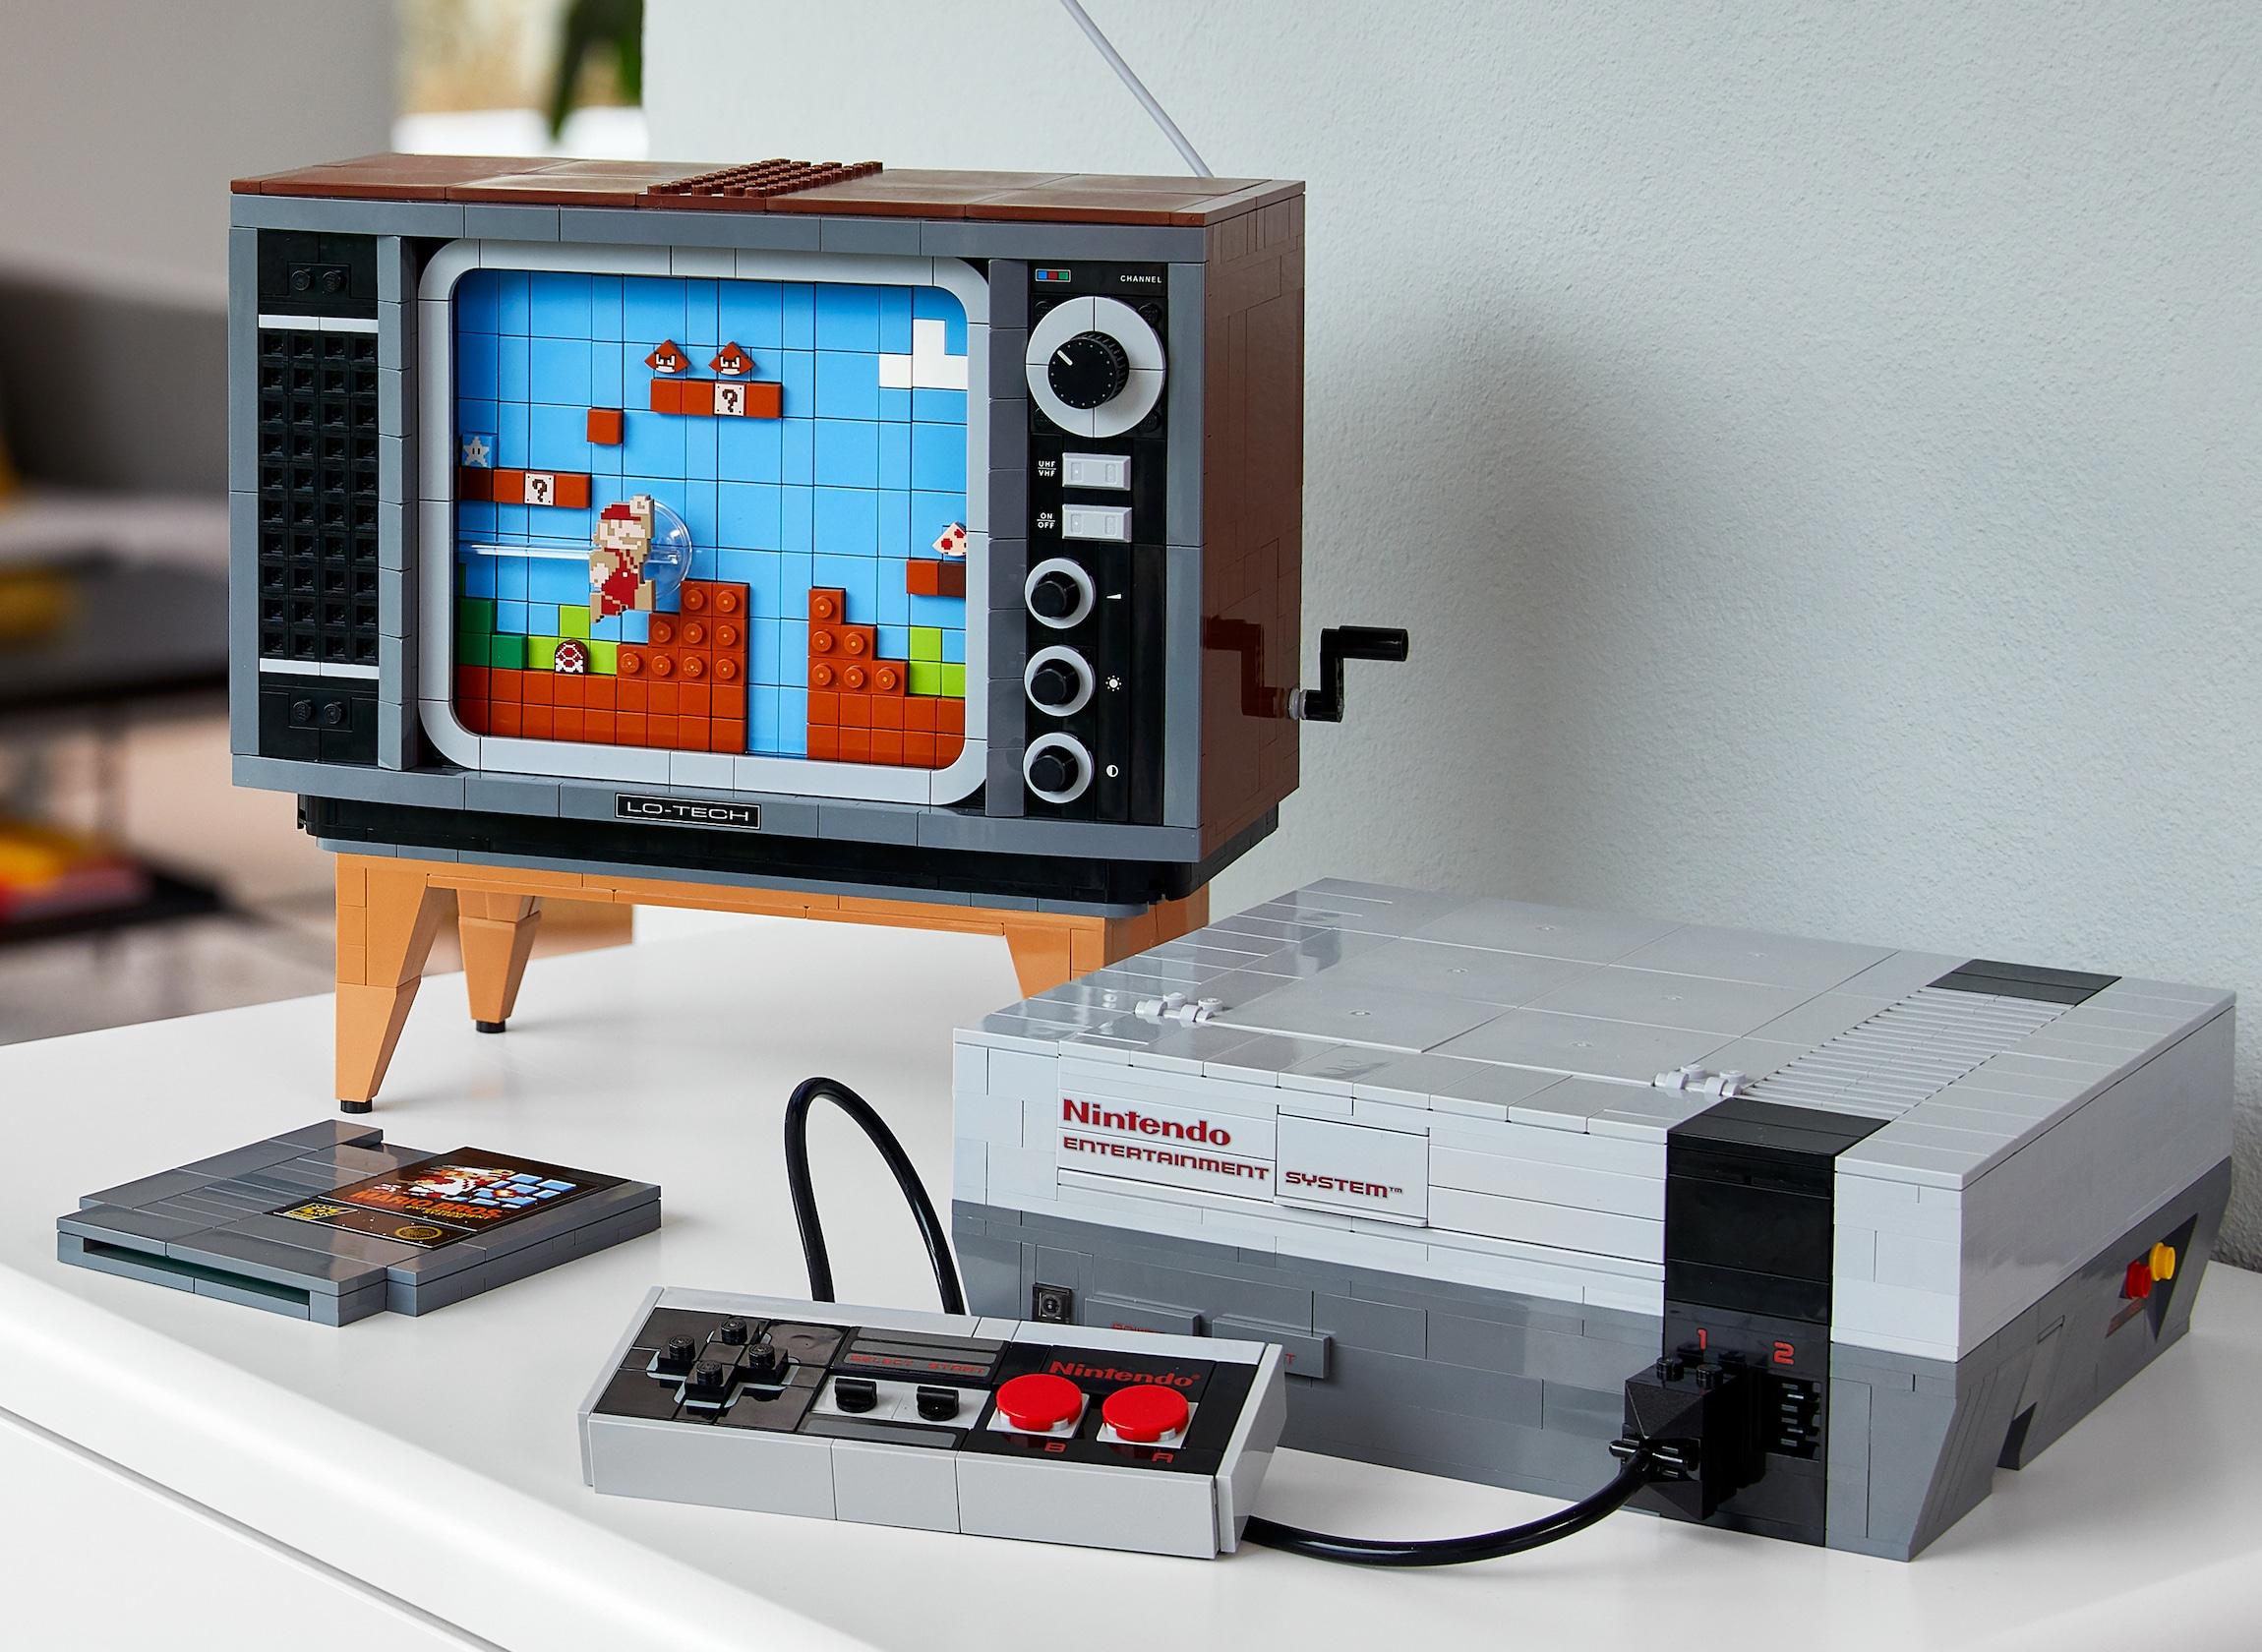 LEGO NES Building Kit is a brilliant reimagining of the original Nintendo console 15